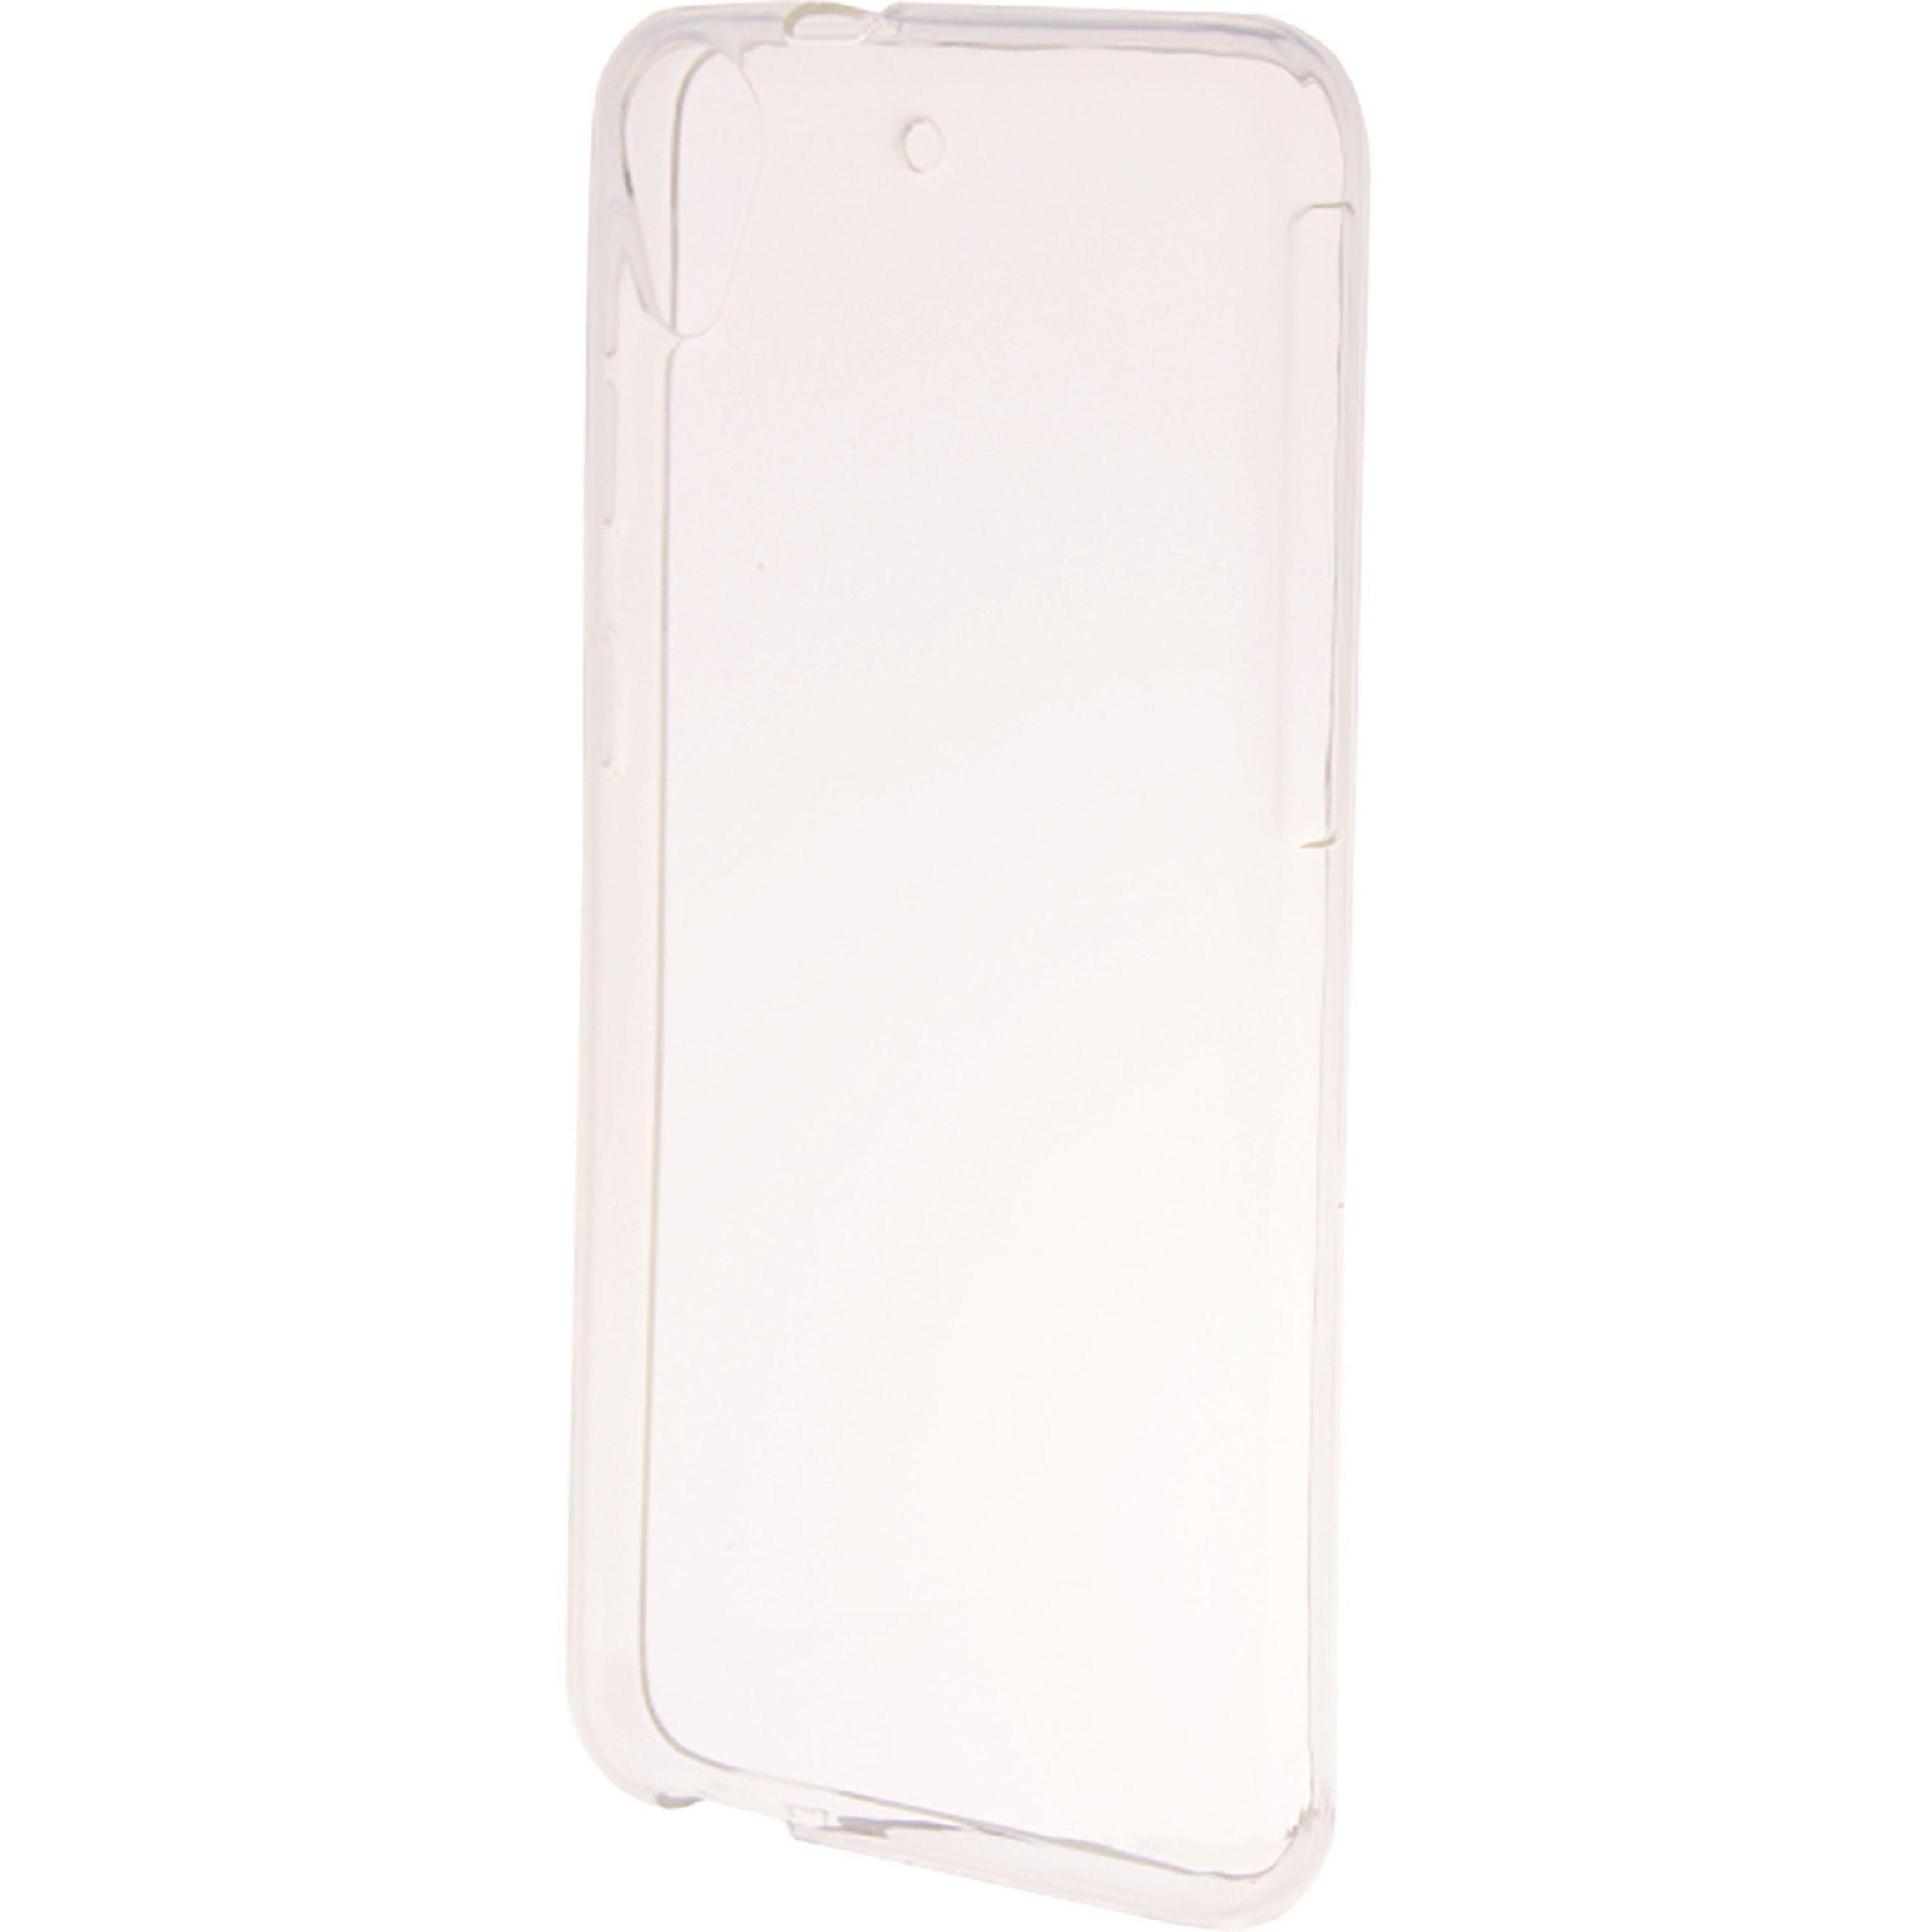 Image of   Telefon Gel-Etui HTC Desire 650 Gennemsigtig